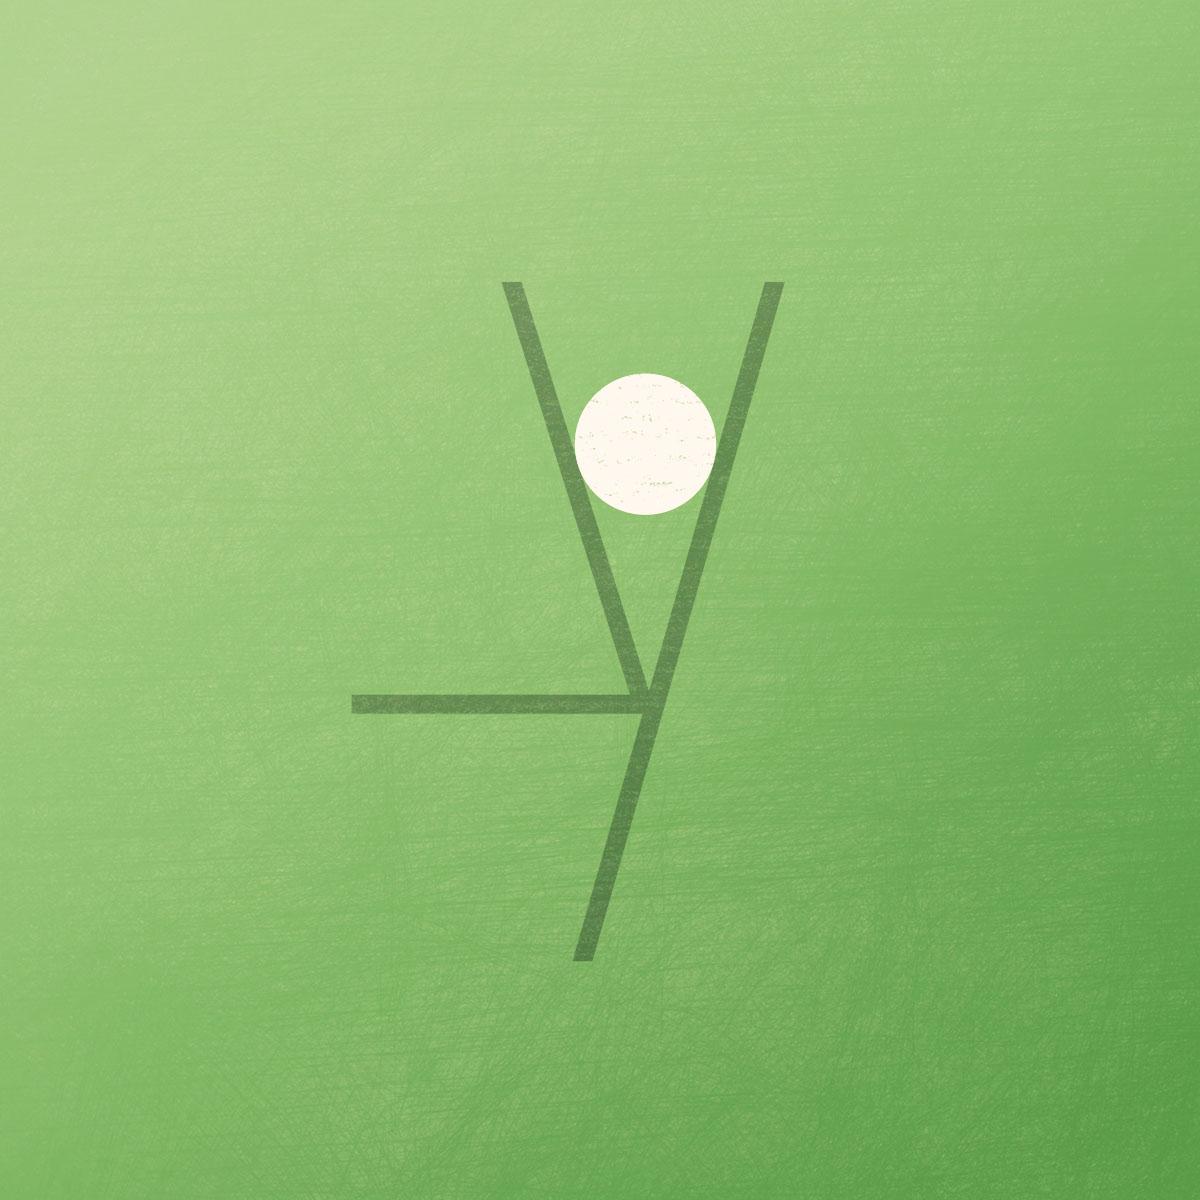 Joy-2_1x1_square.jpg